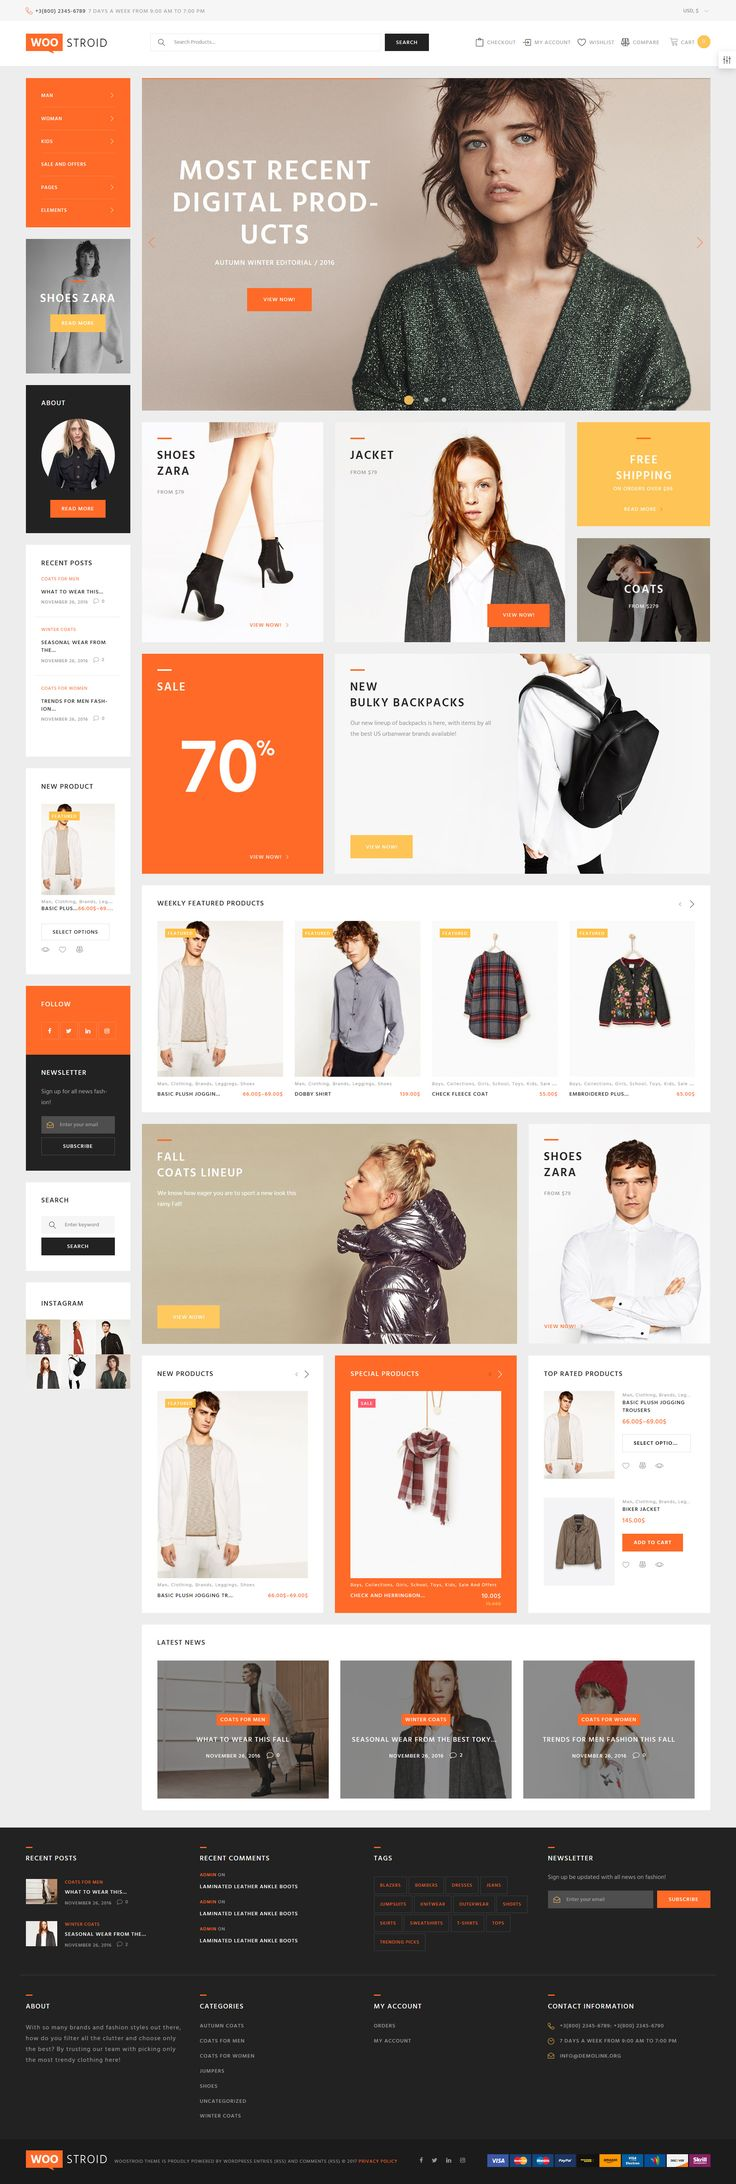 Woostroid - Multipurpose WooCommerce Theme Big Screenshot - https://www.templatemonster.com/woocommerce-themes/woostroid.html